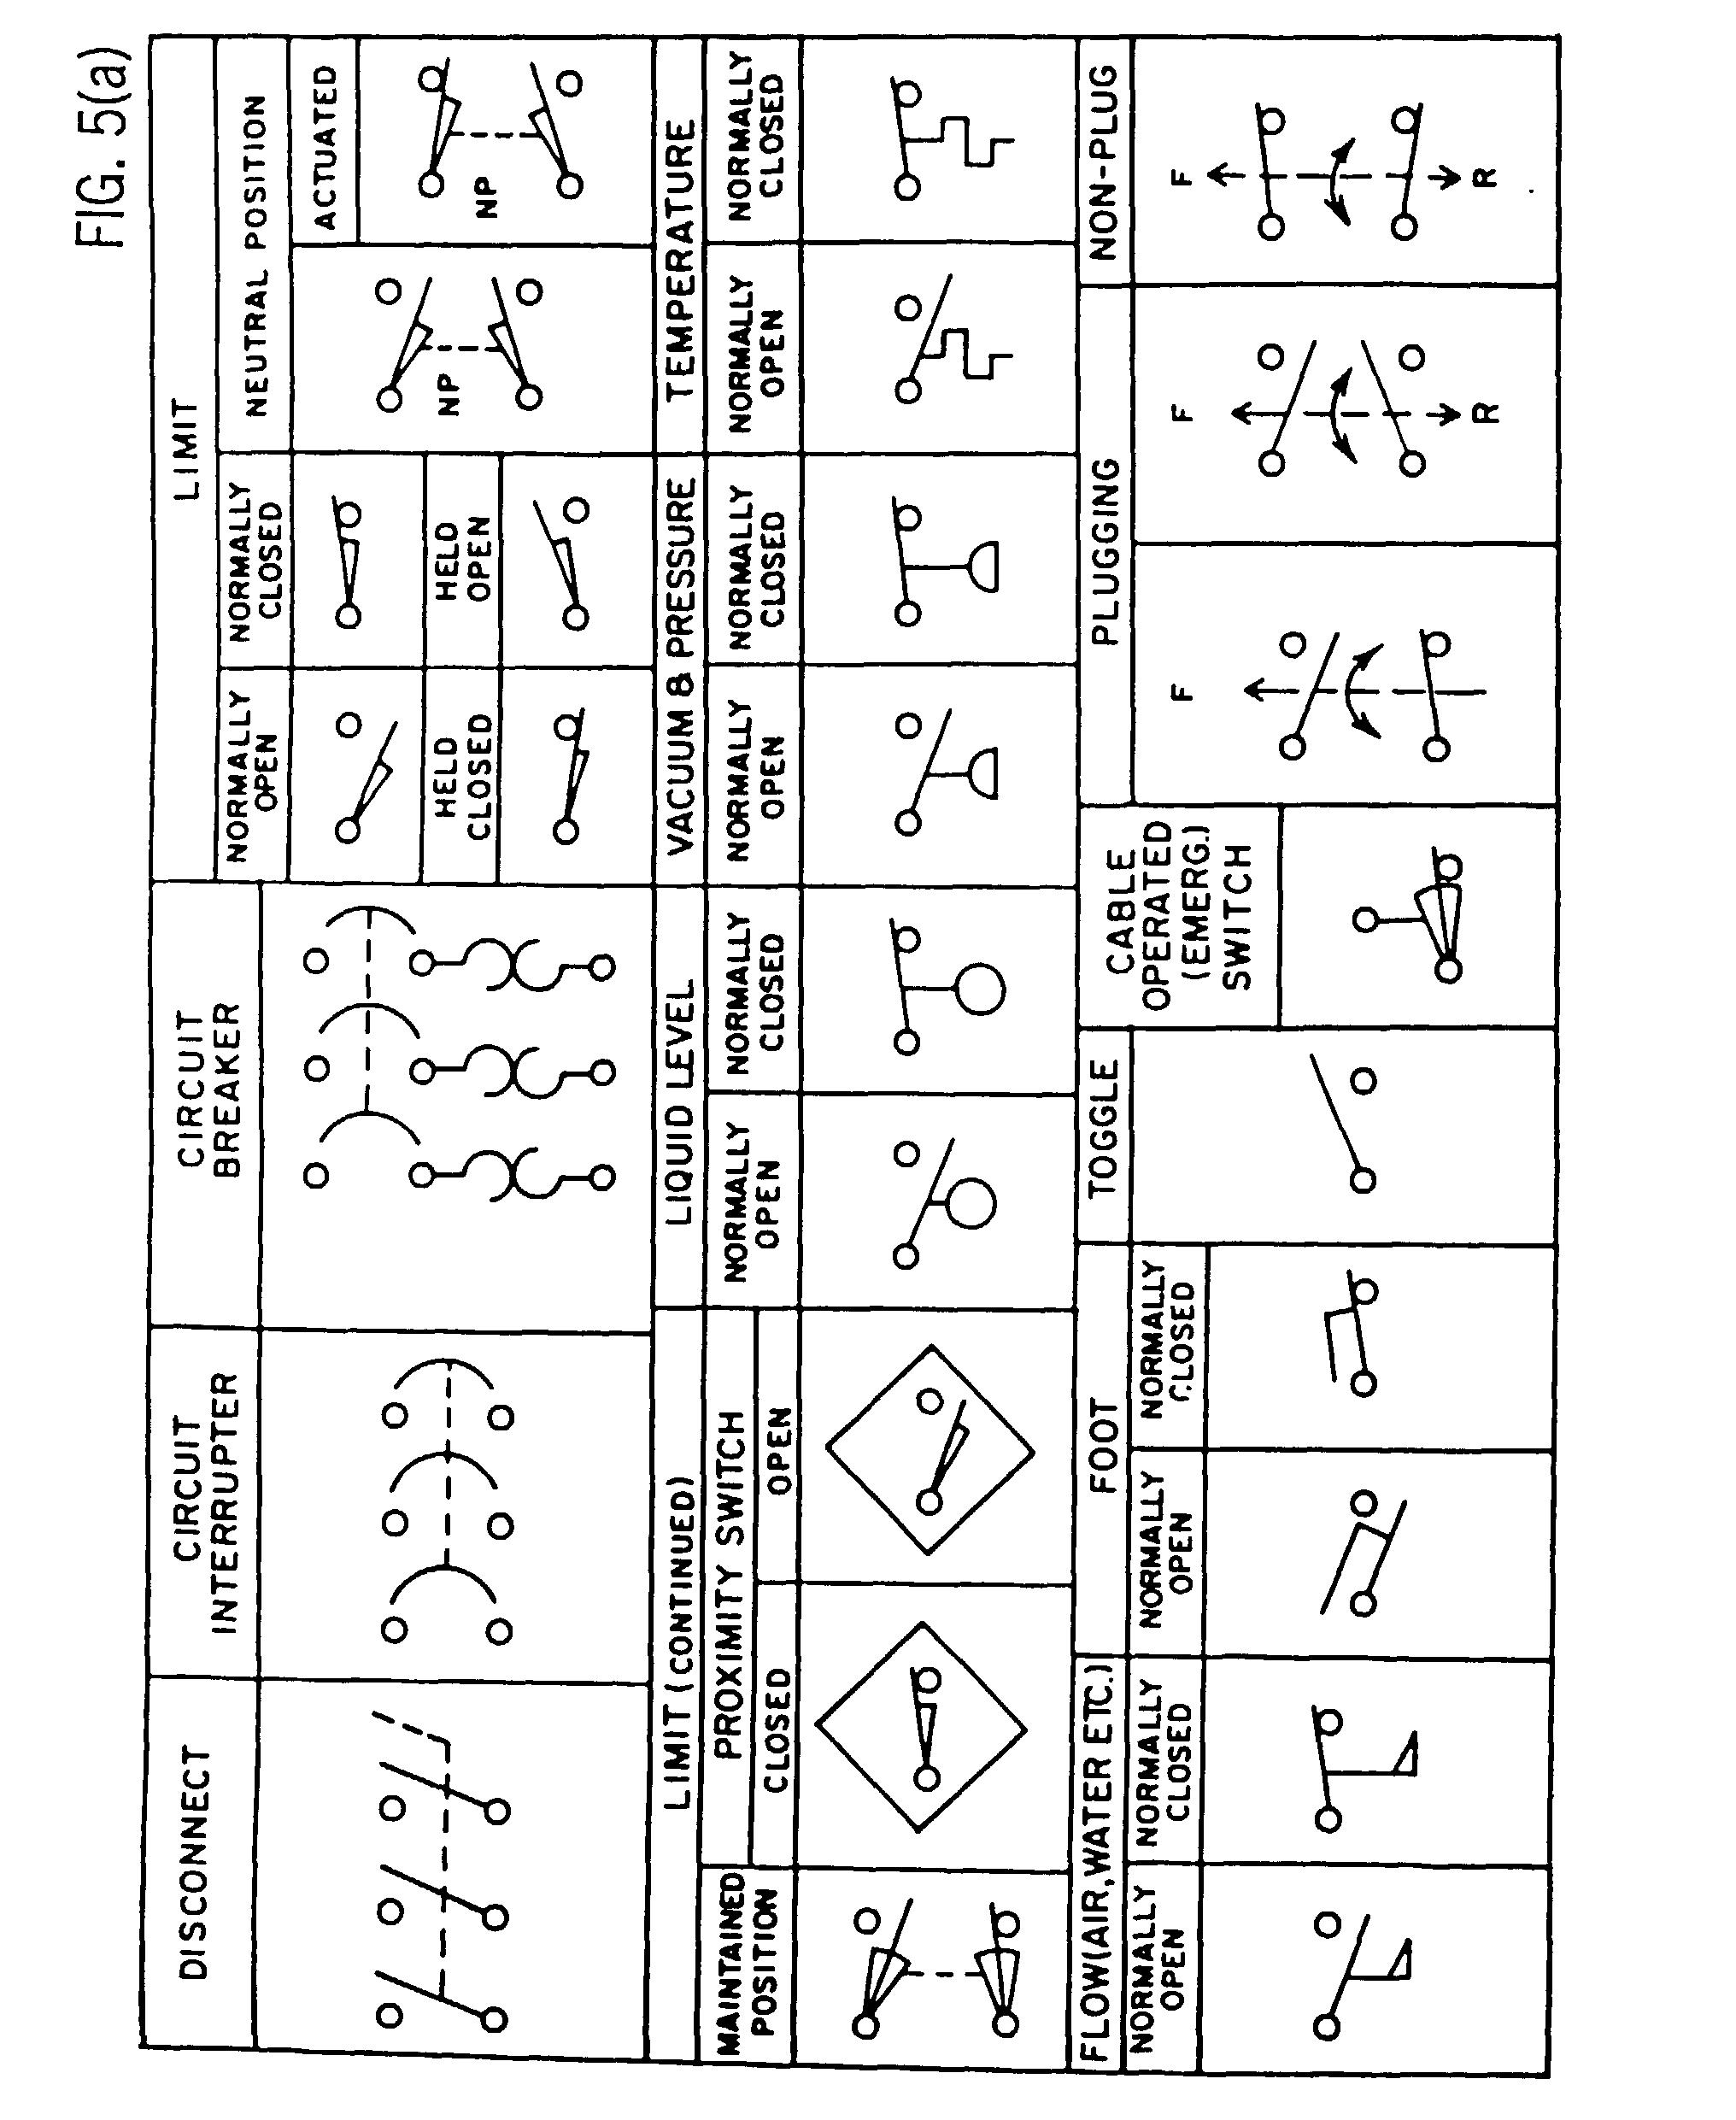 industrial wiring diagram symbols flat gun electrical schematic symbol chart get free